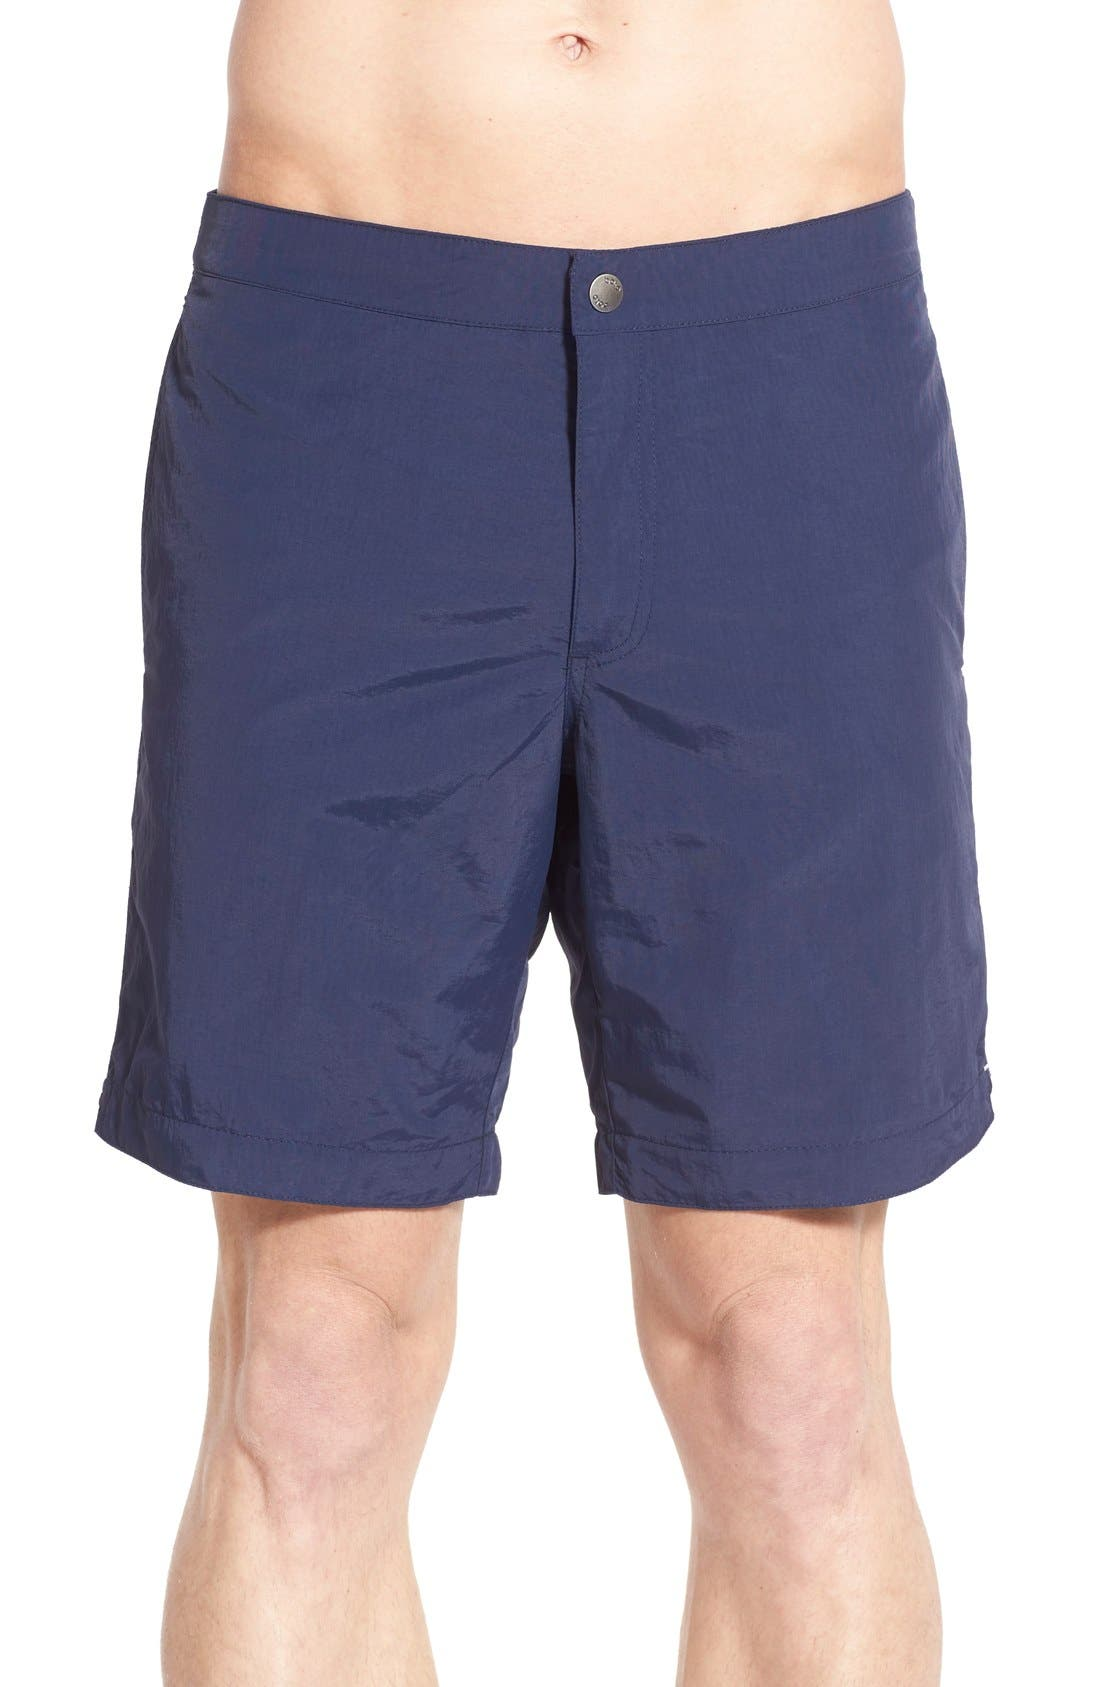 boto Aruba Tailored Fit 8.5 Inch Swim Trunks